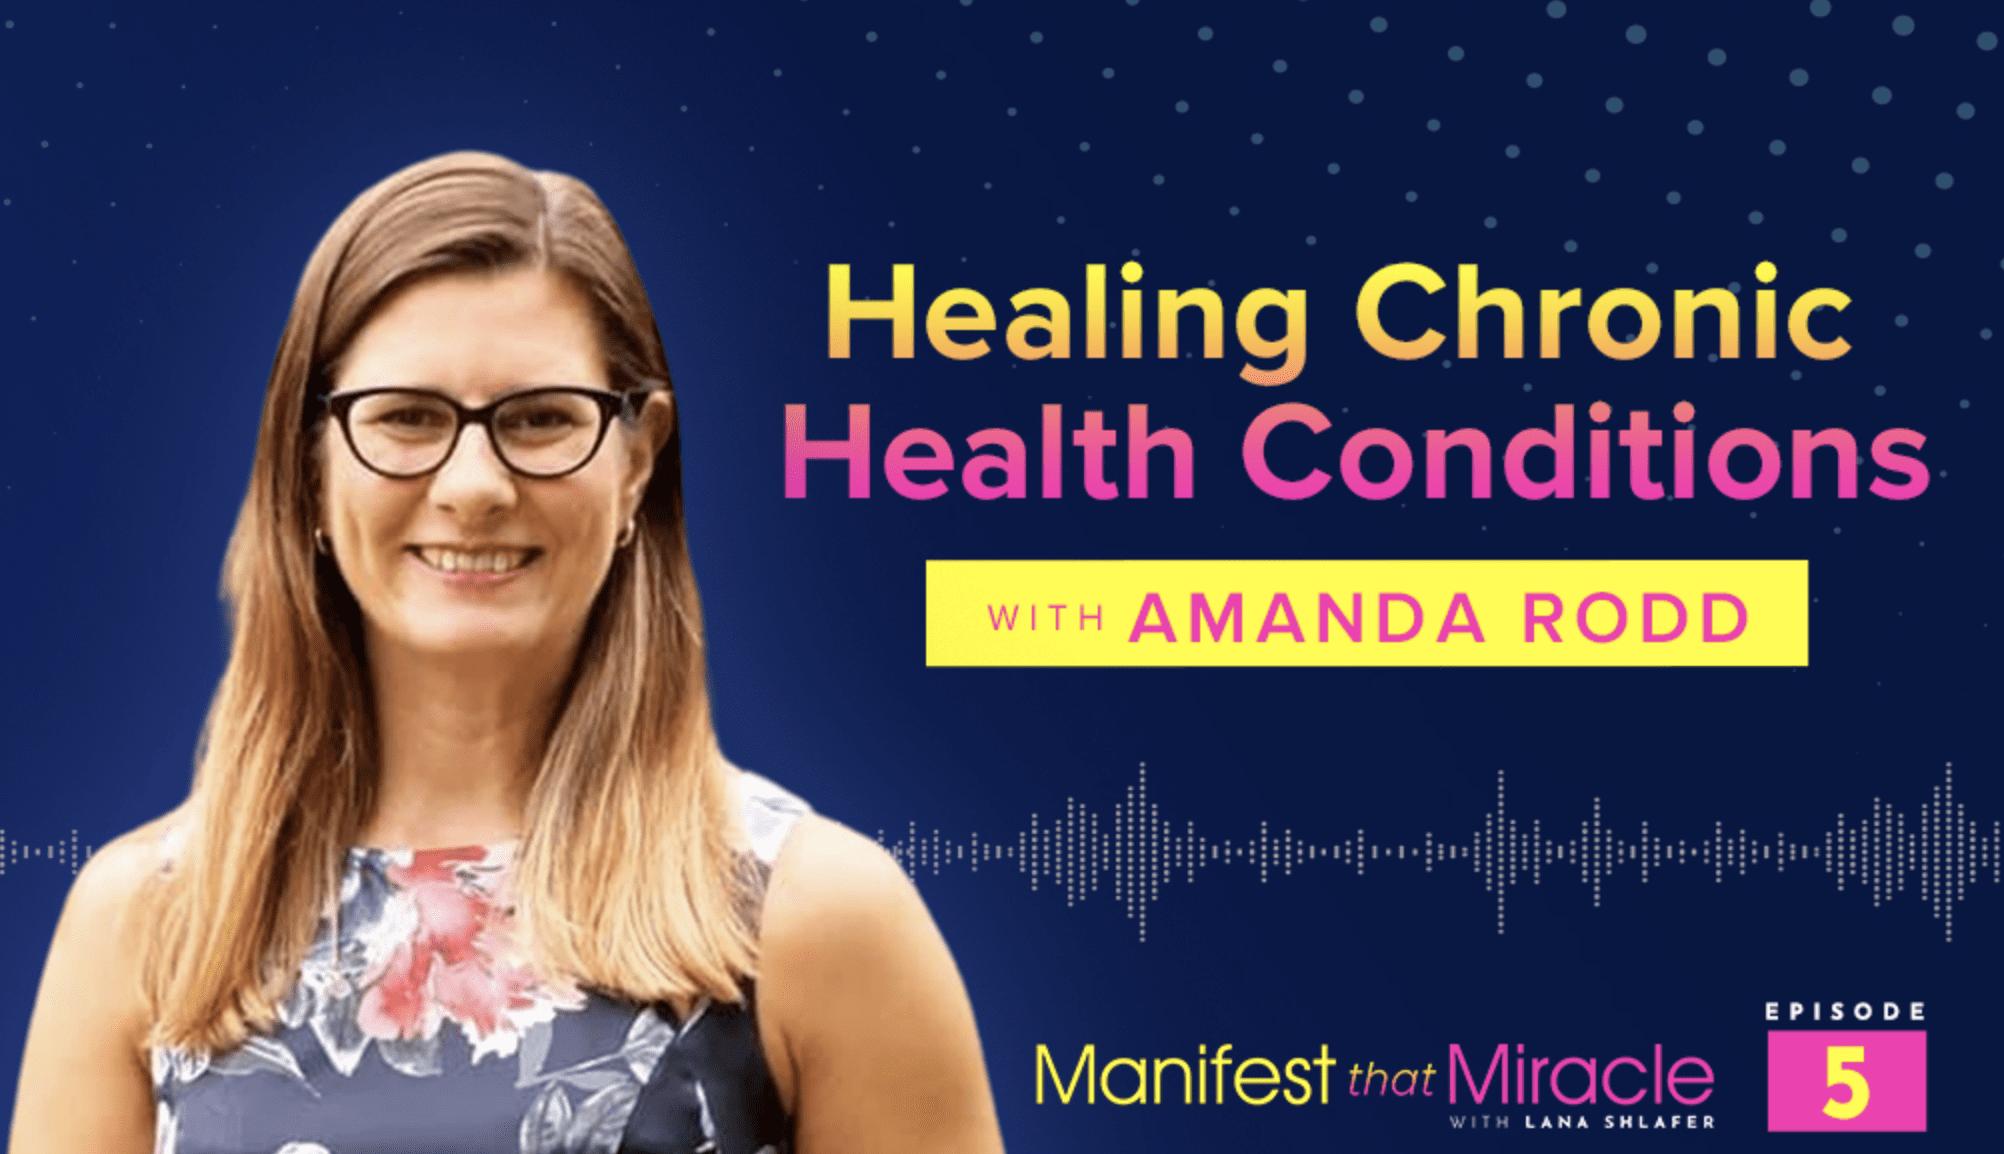 Amanda Rodd: Healing Chronic Health Conditions